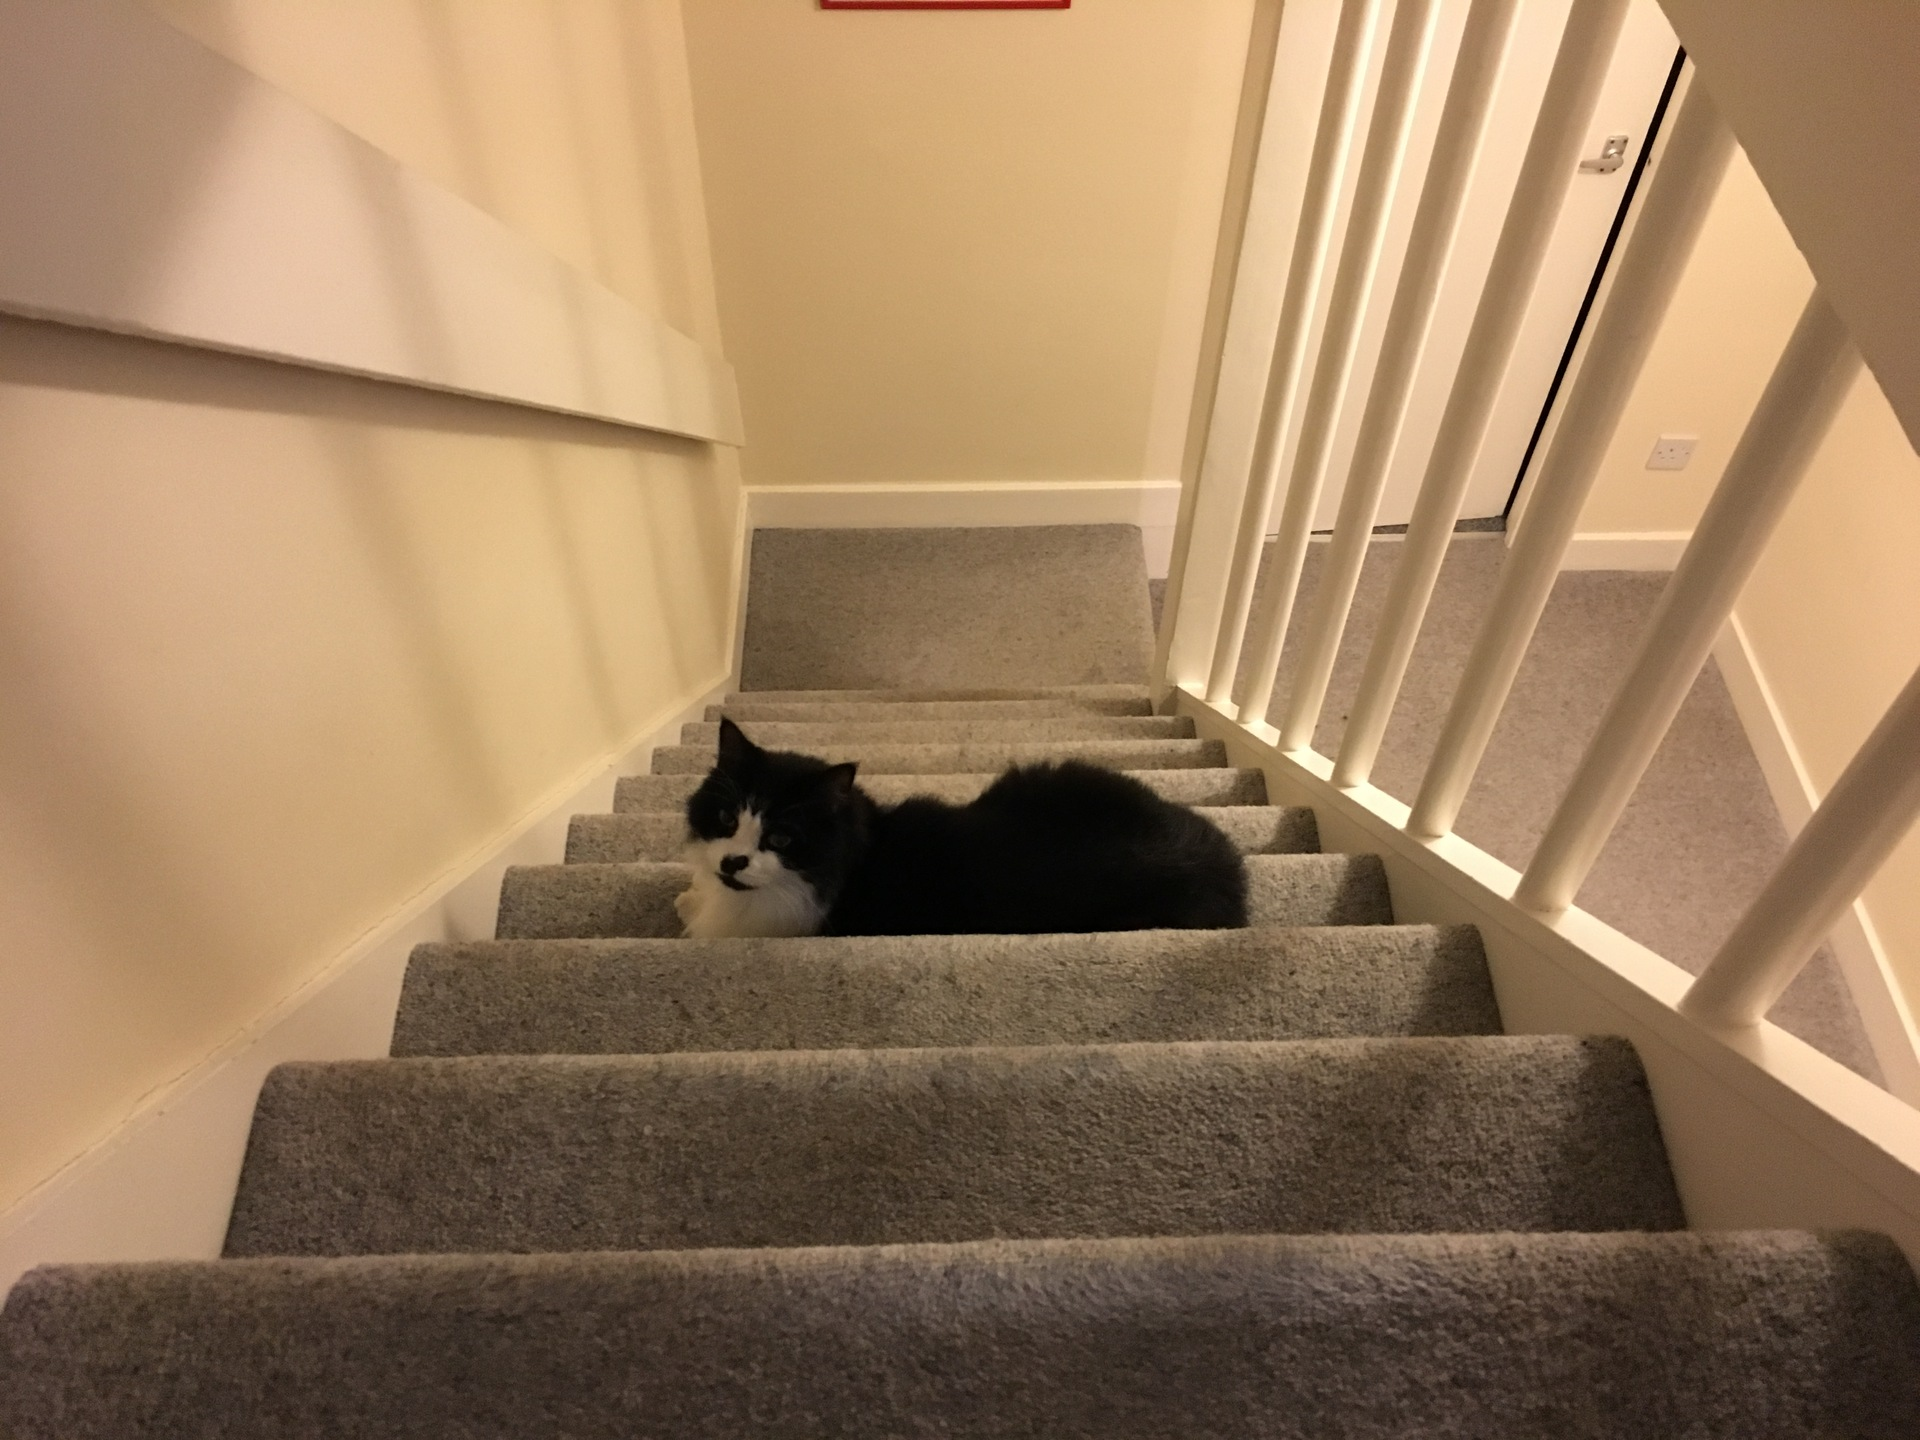 England – Felis silvestris (domestic cat) 'Mr Mittens' – United Kingdom – North East England – Durham – County Durham – The Sands – Durham Home — Tue 21 Feb 2017 18-55-00 GMT — 3872609887